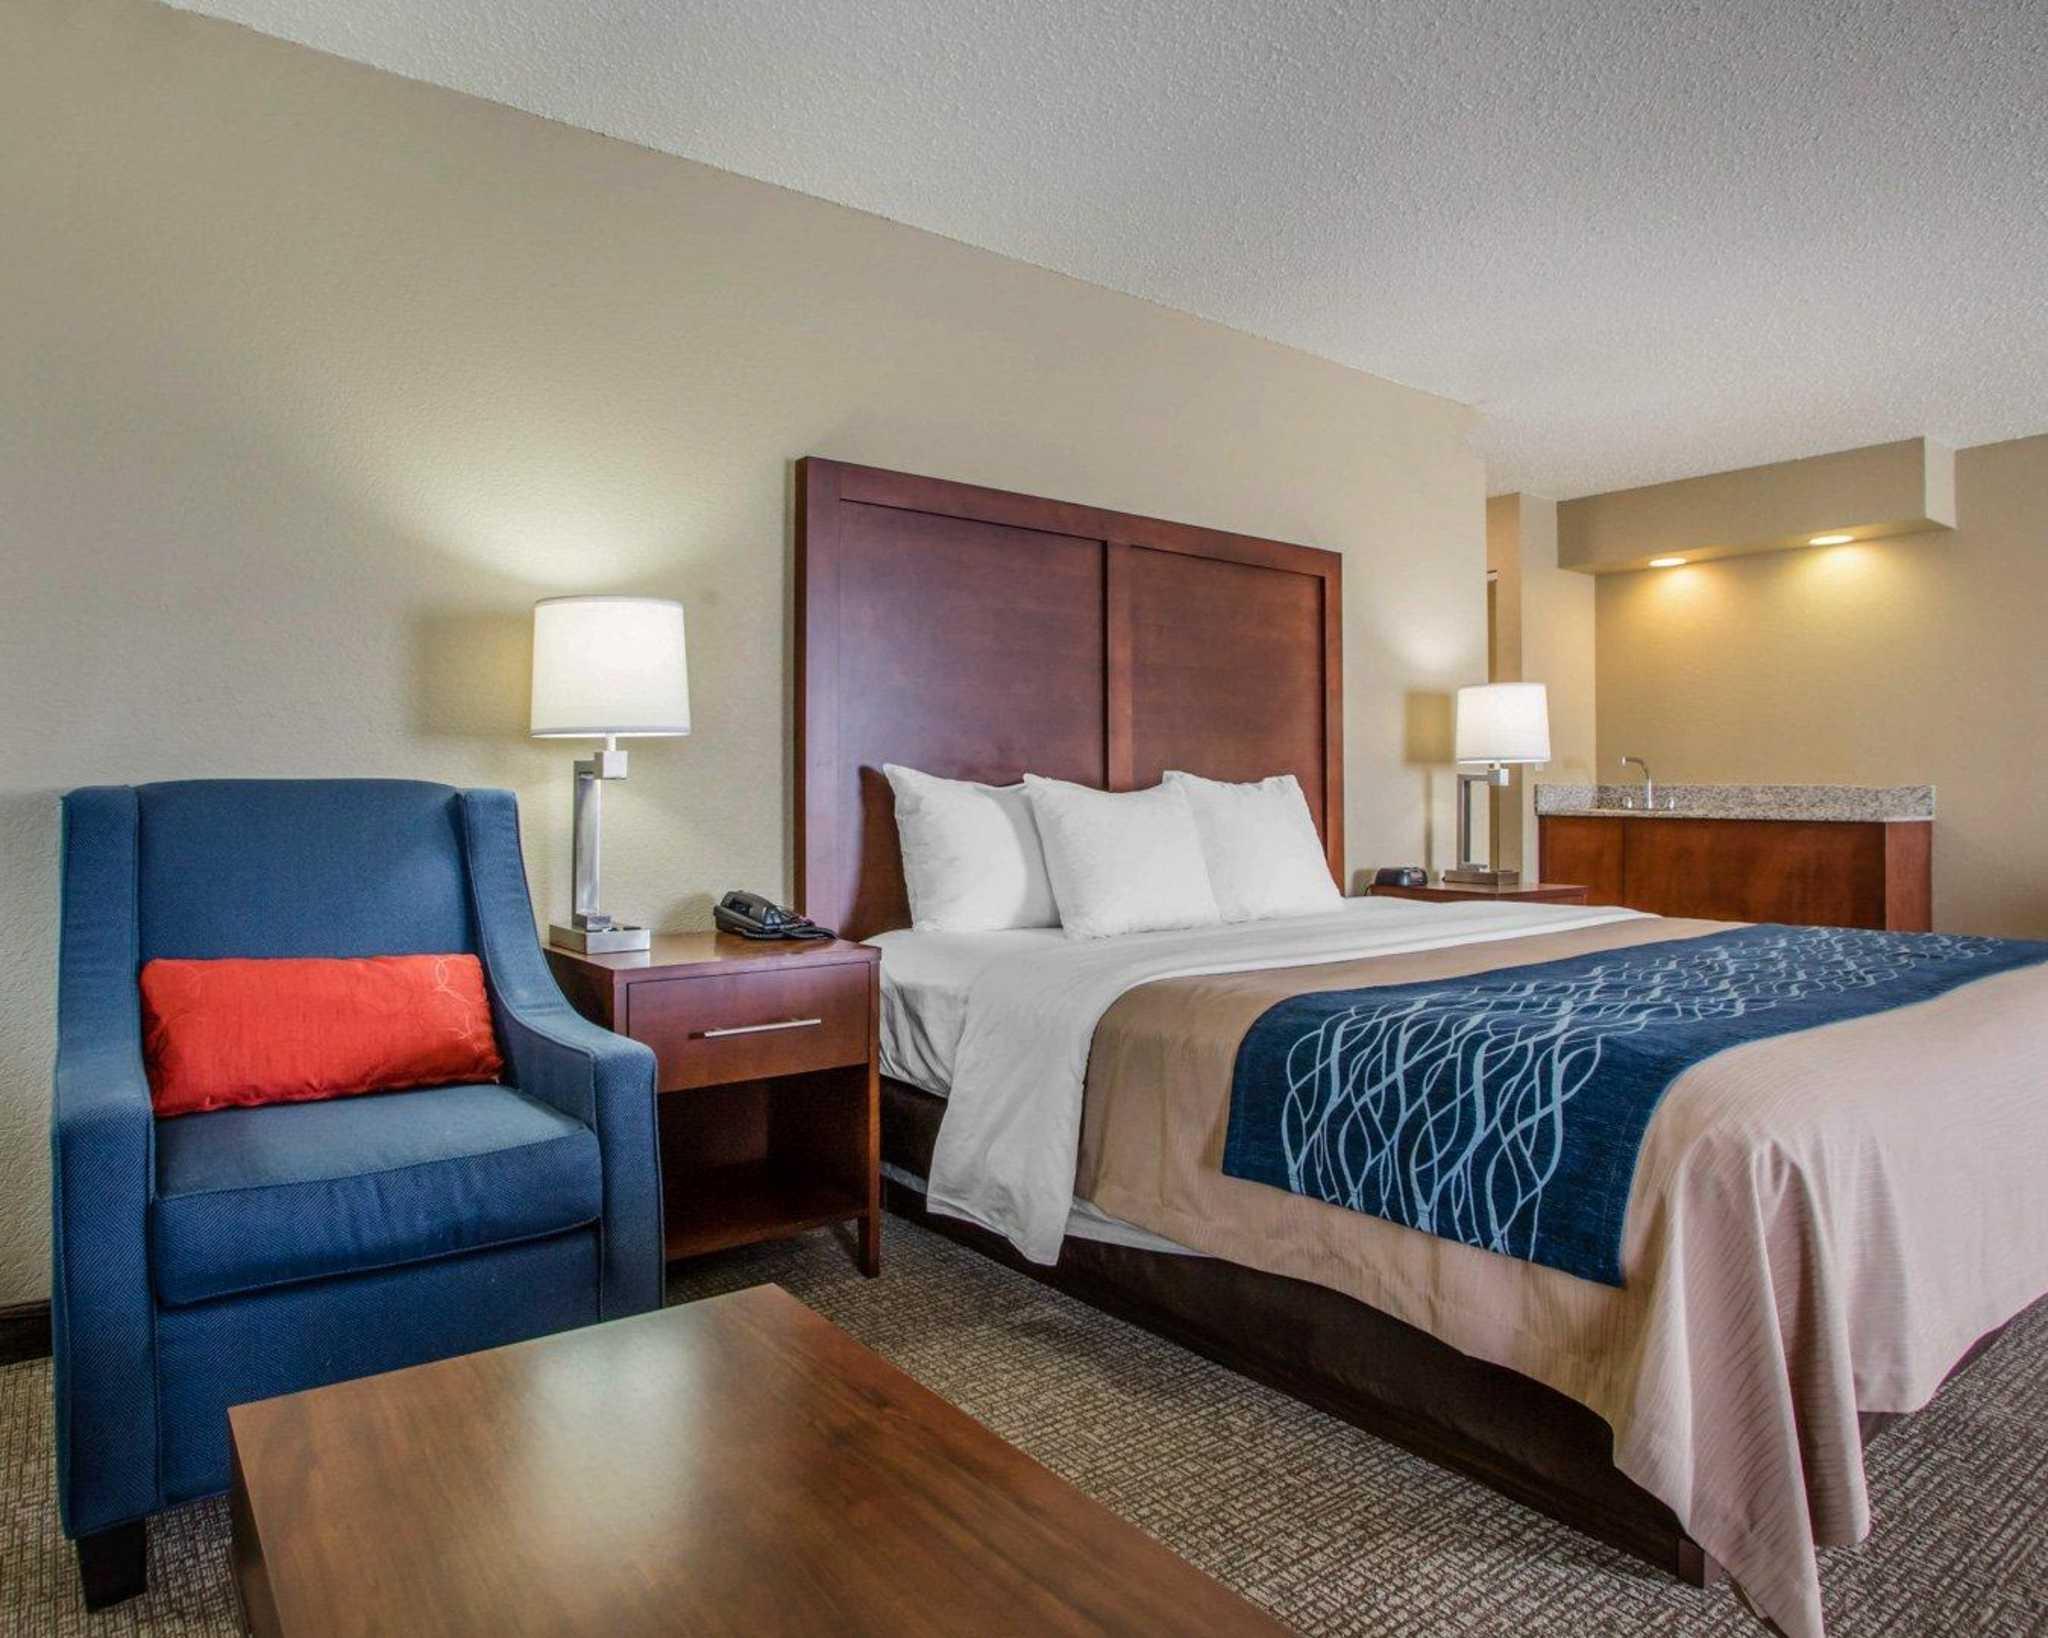 Comfort Inn & Suites Jackson - West Bend image 10